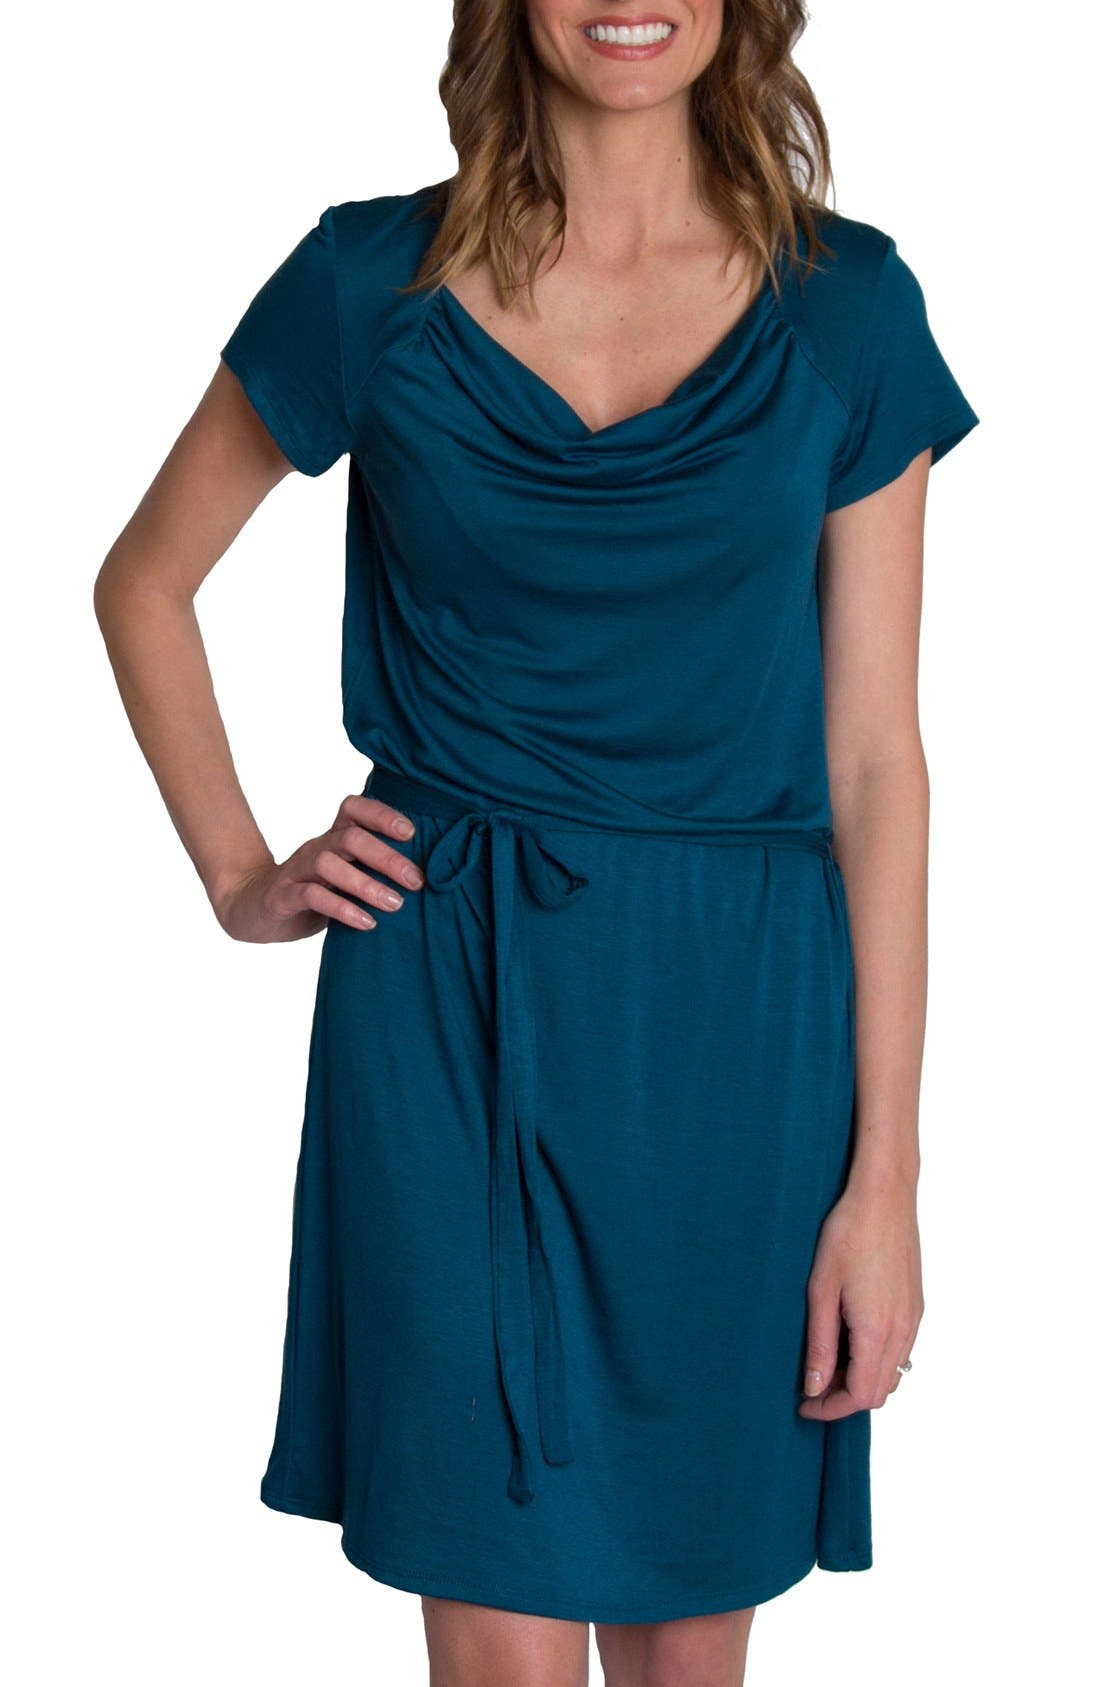 'Chic' Cowl Neck Nursing Dress,                         Main,                         color, Teal